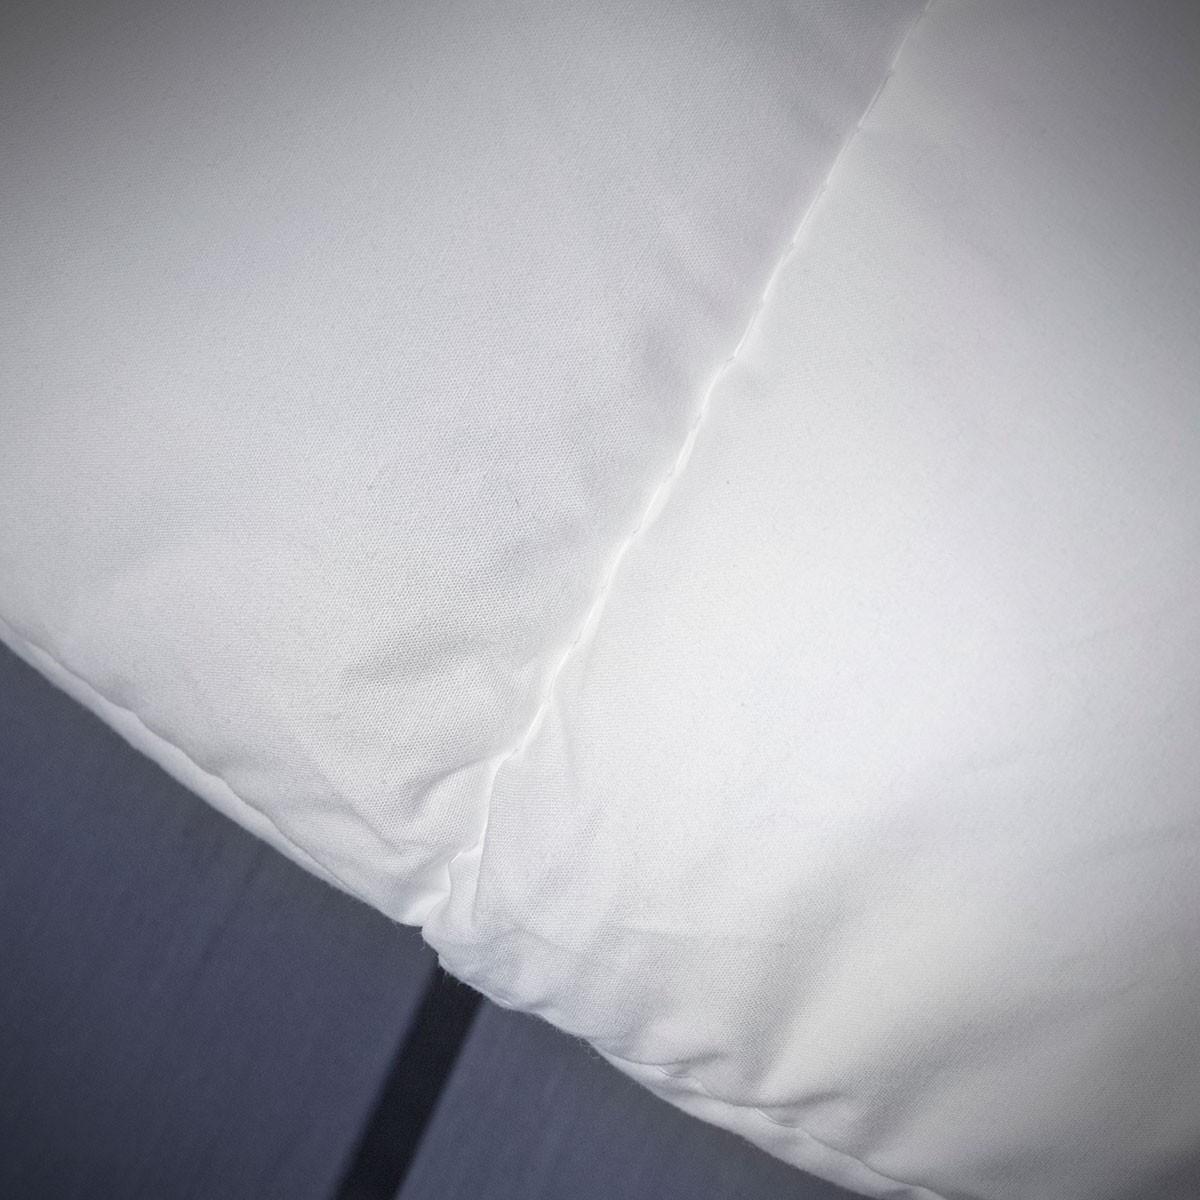 couette microfibre hiver alliance couettes. Black Bedroom Furniture Sets. Home Design Ideas